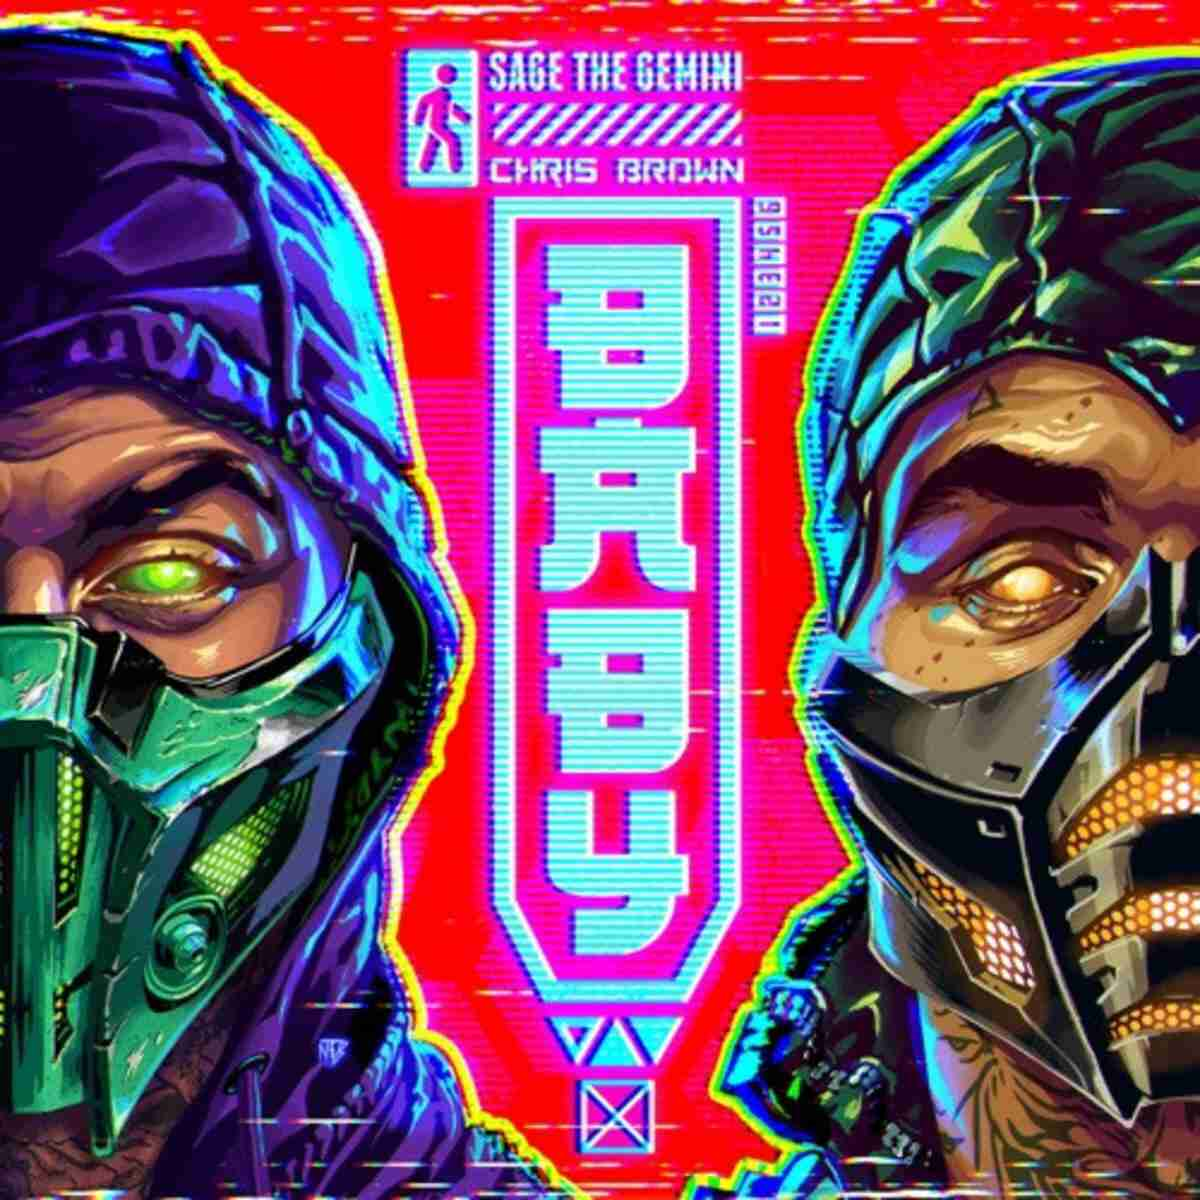 Sage The Gemini – Baby Ft. Chris Brown